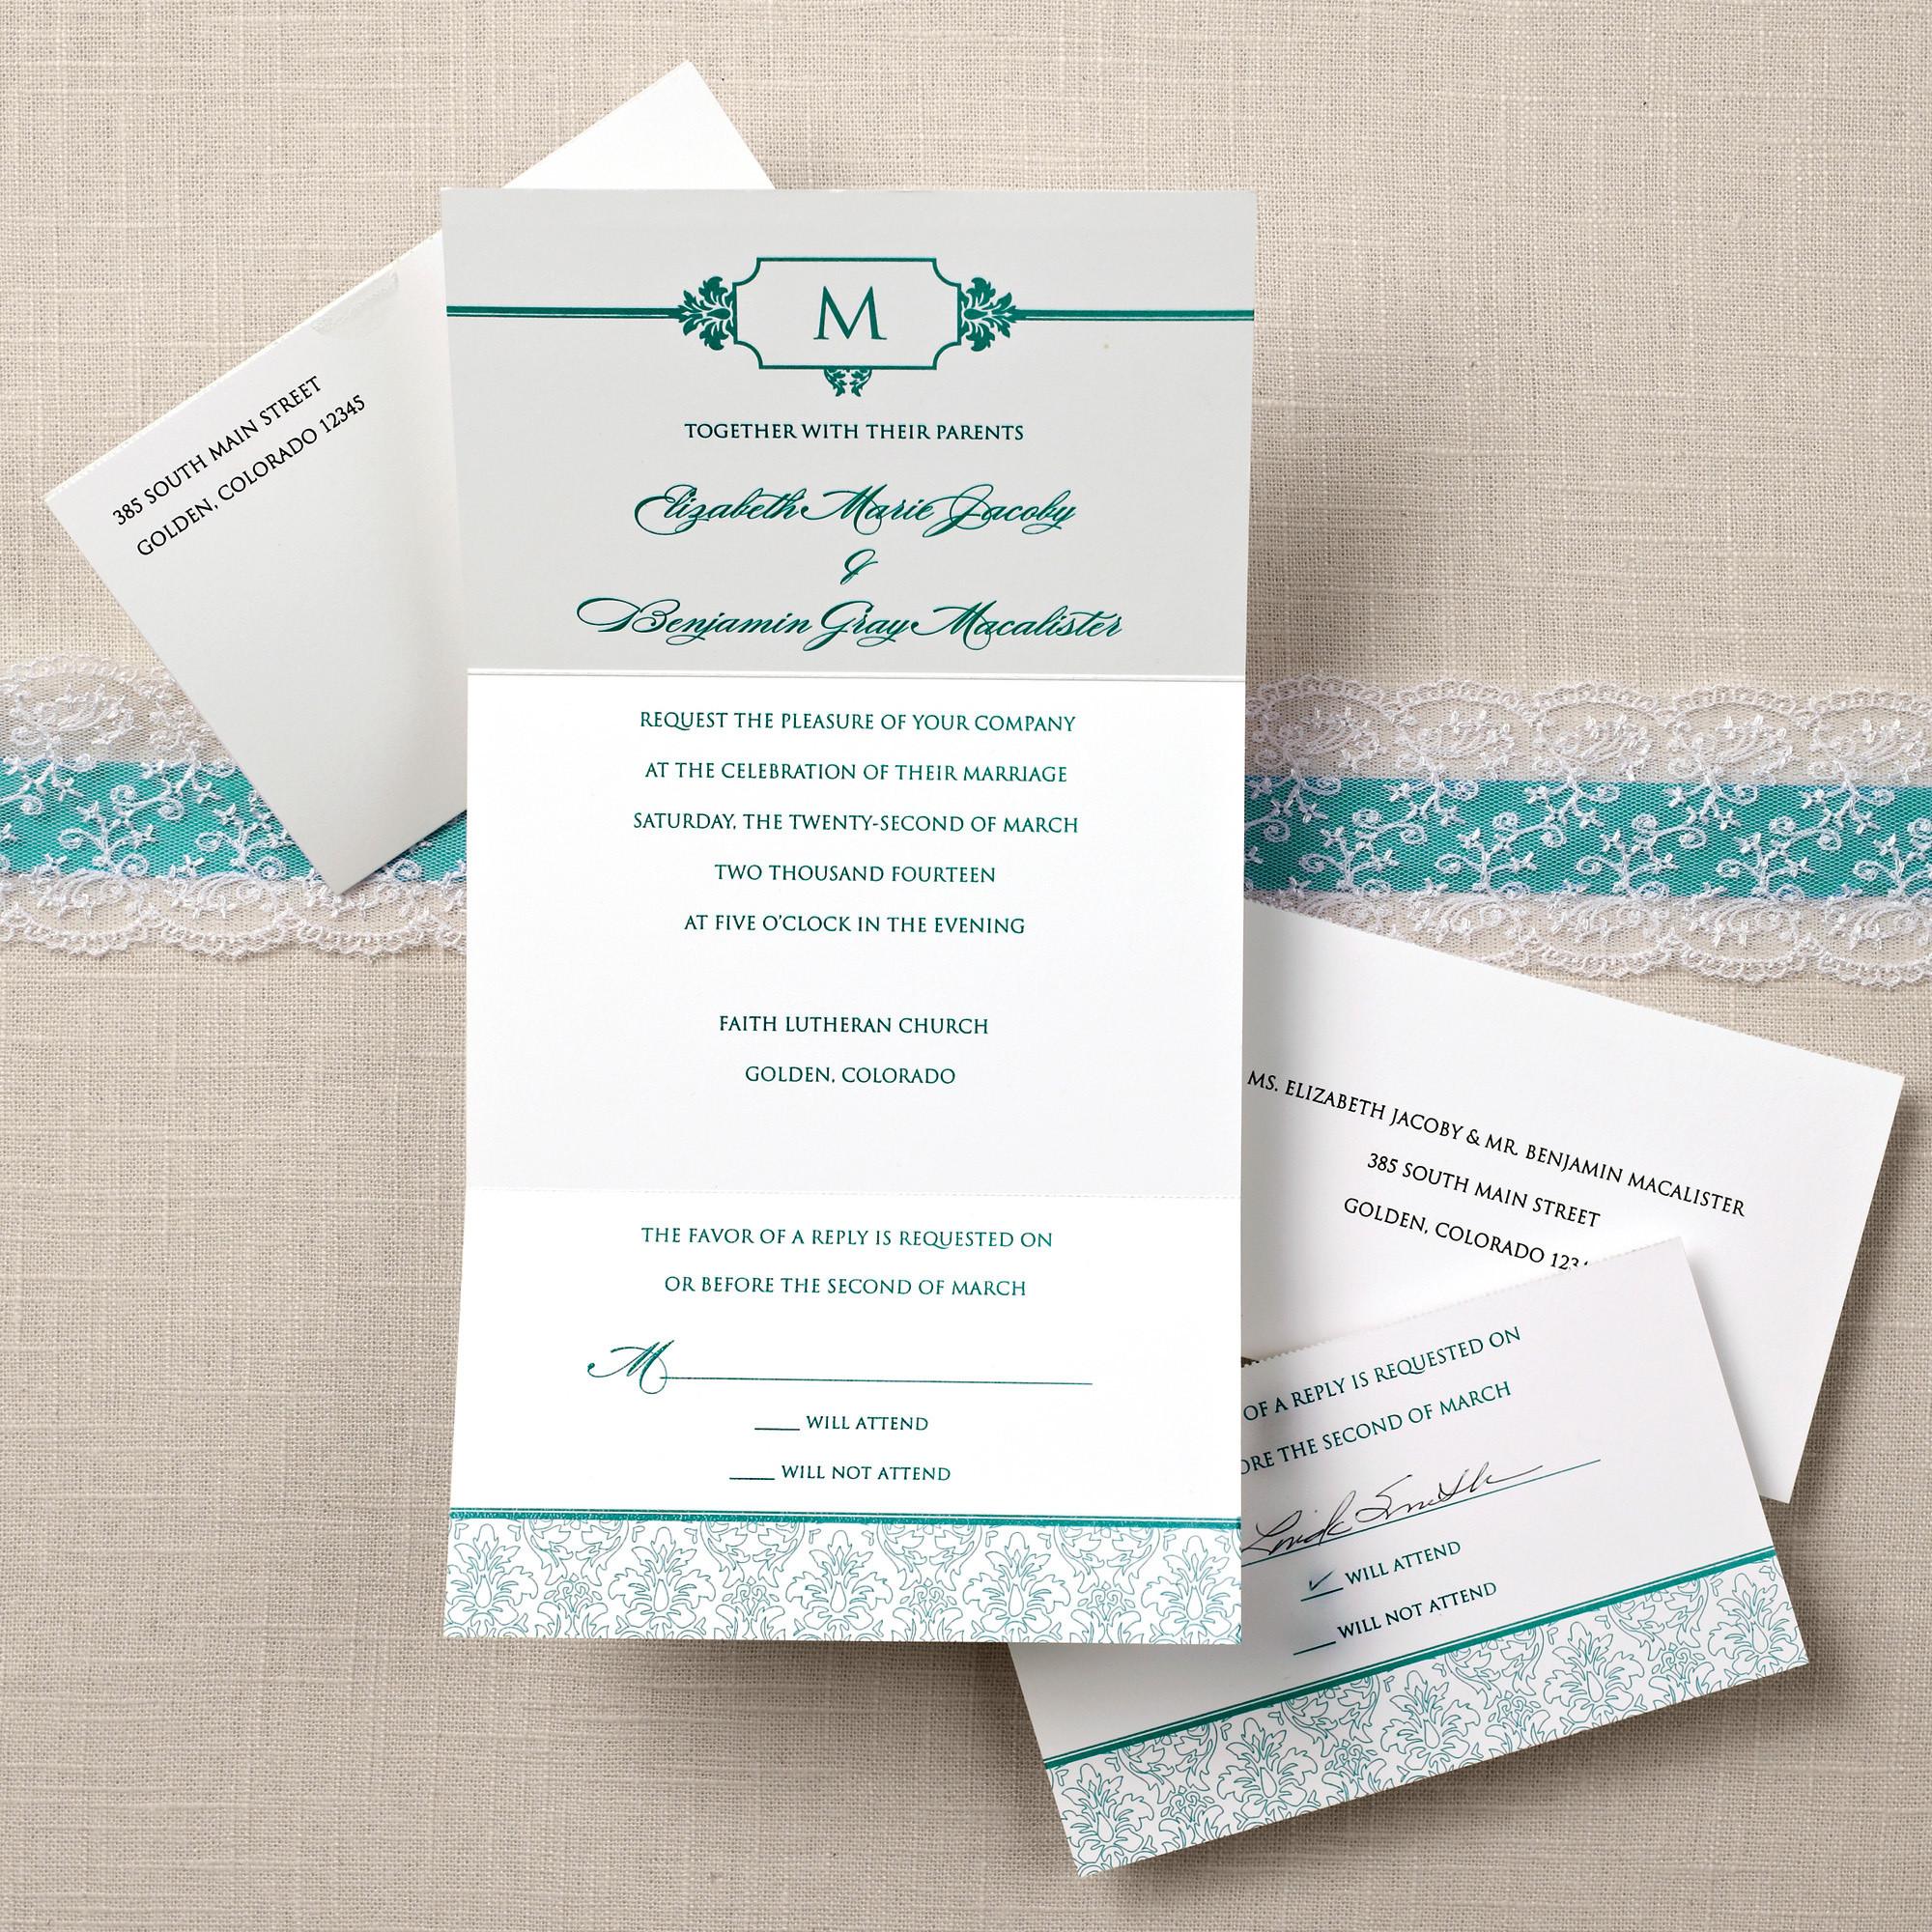 damask seal and send wedding invitation  wedding invitation, Wedding invitations